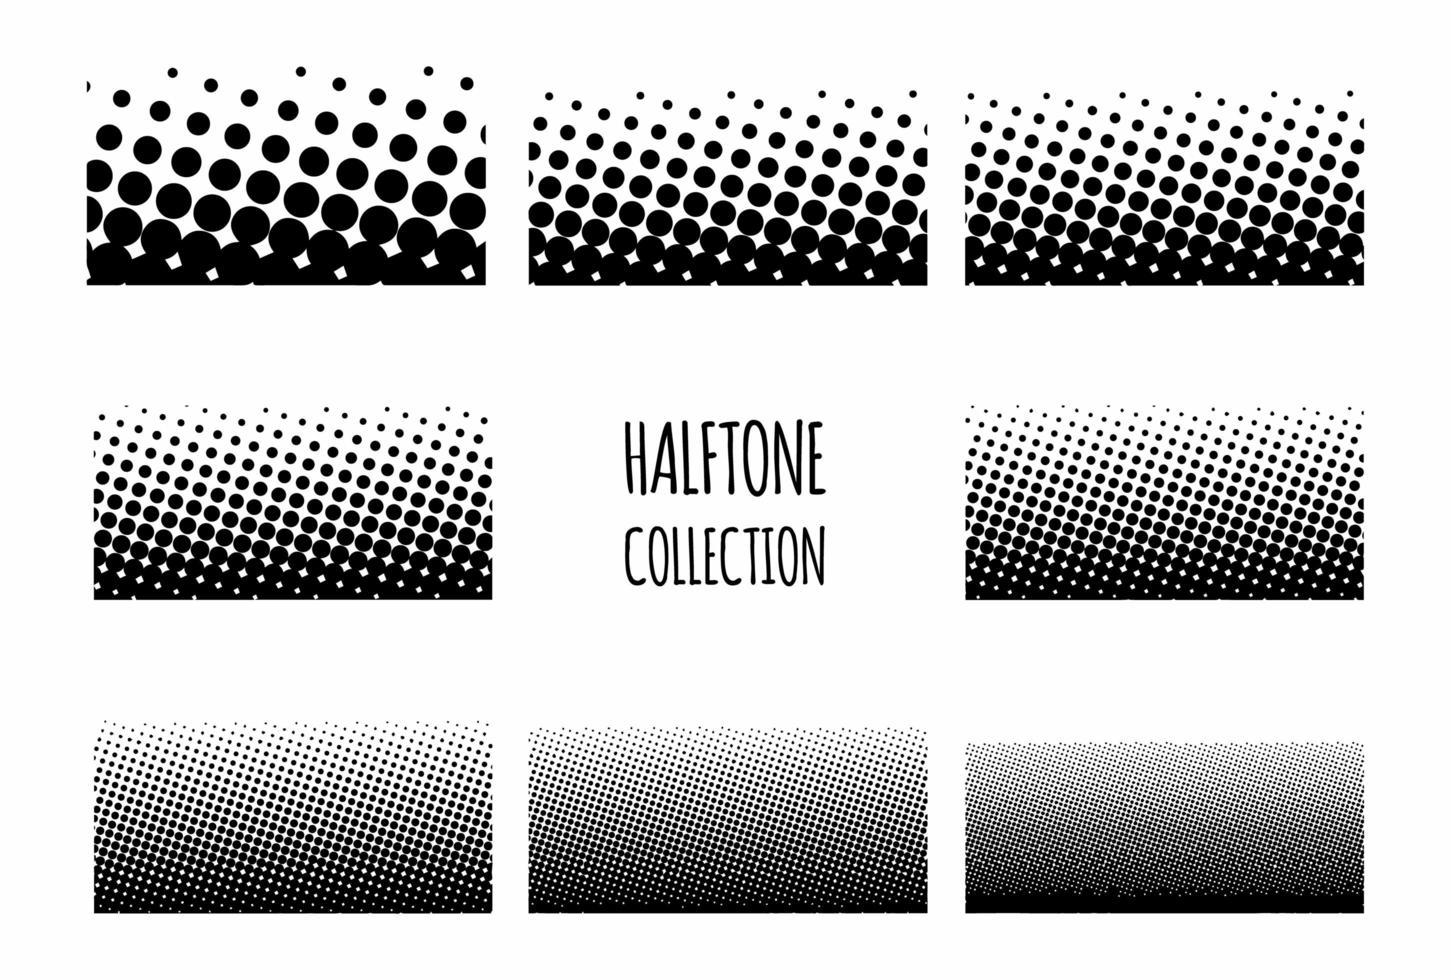 Halbtonmuster-Sammlung mit Farbverlauf vektor